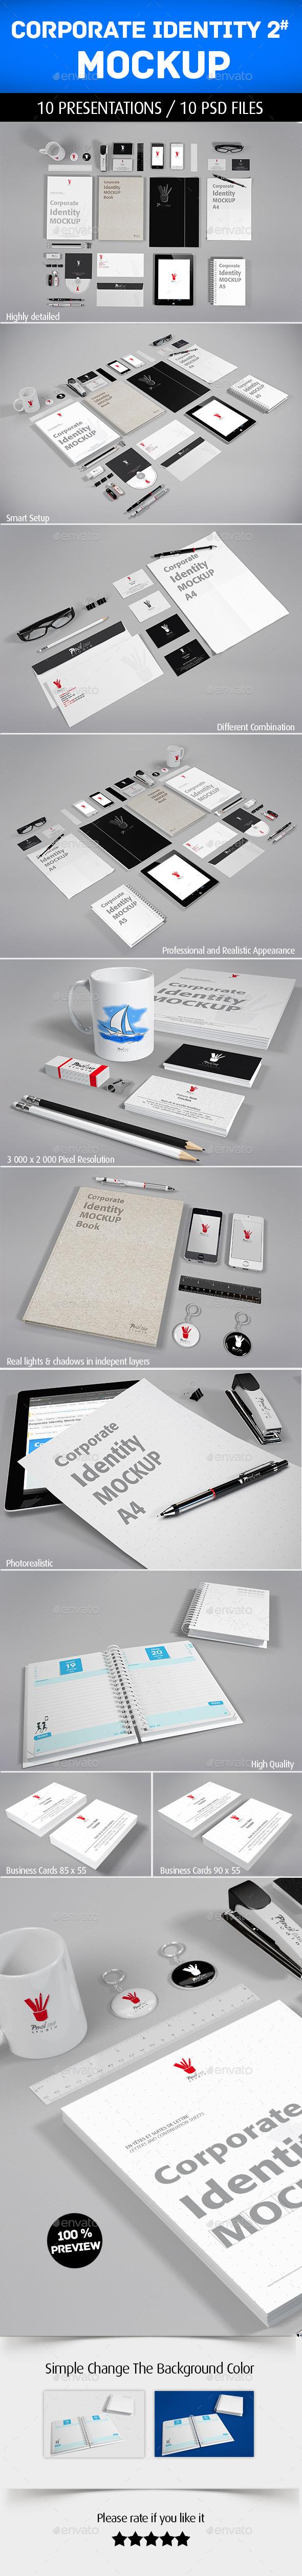 Corporate Identity Mockup V2 - Product Mock-Ups Graphics